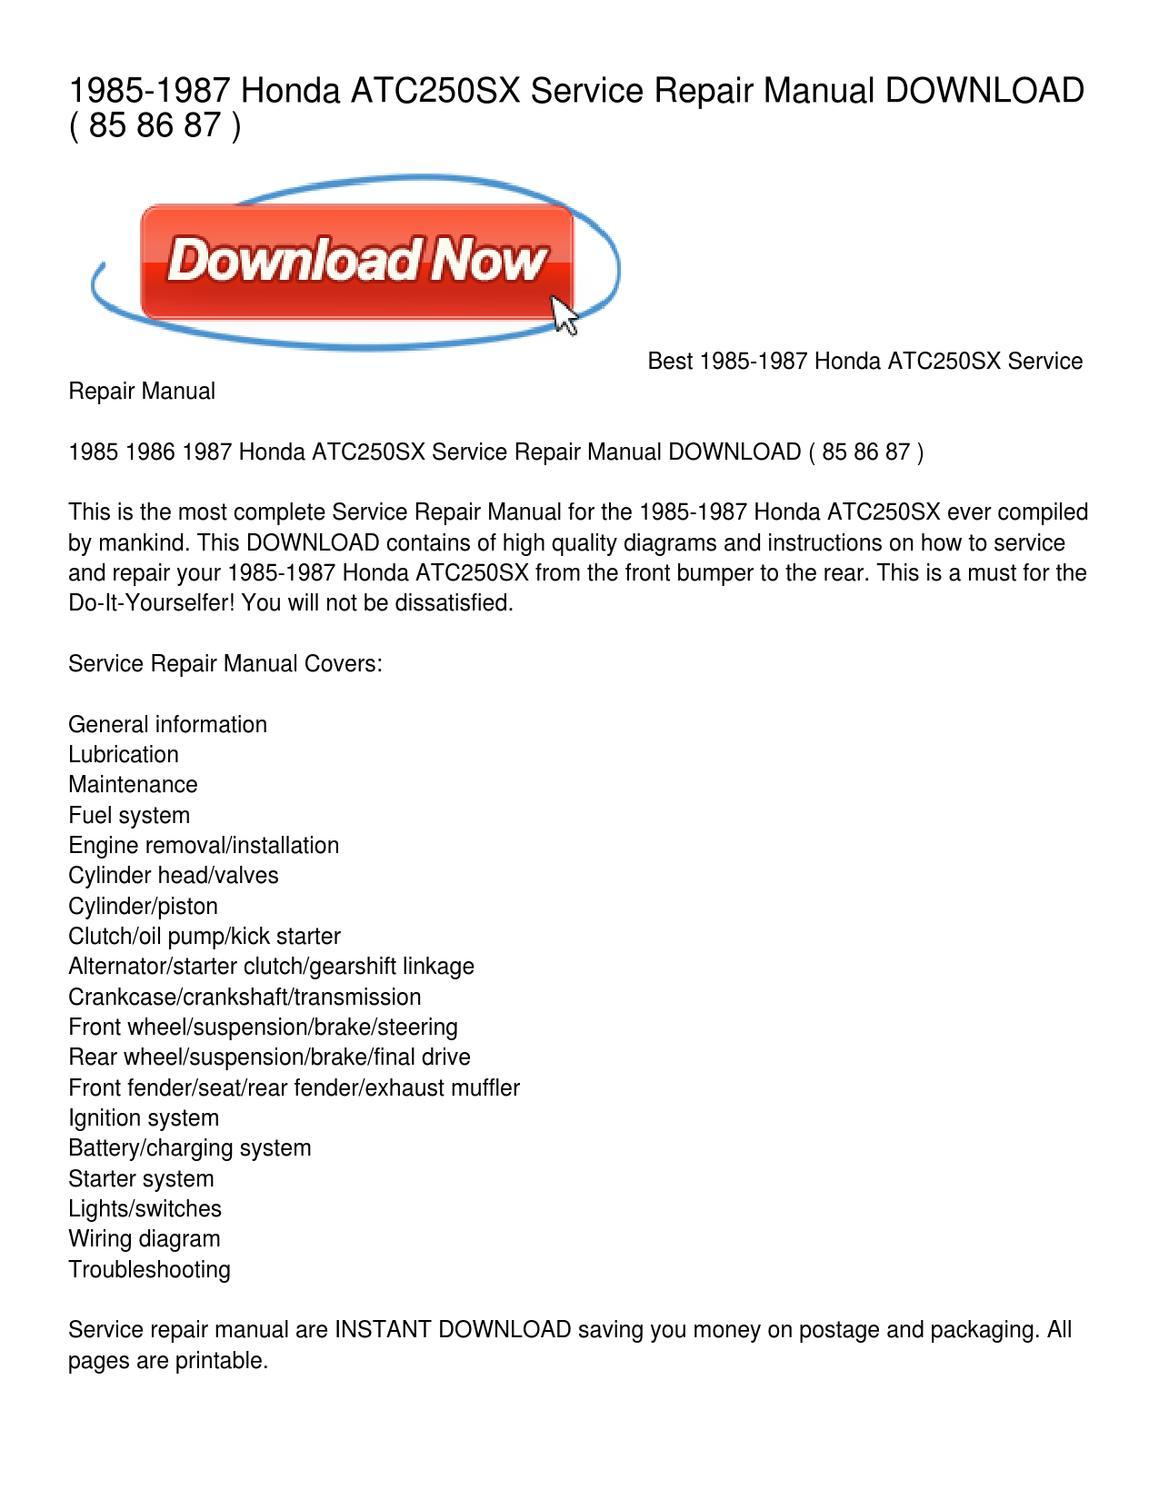 hight resolution of 1985 1987 honda atc250sx service repair manual by leonard colmenero issuu honda atc250sx wiring diagram